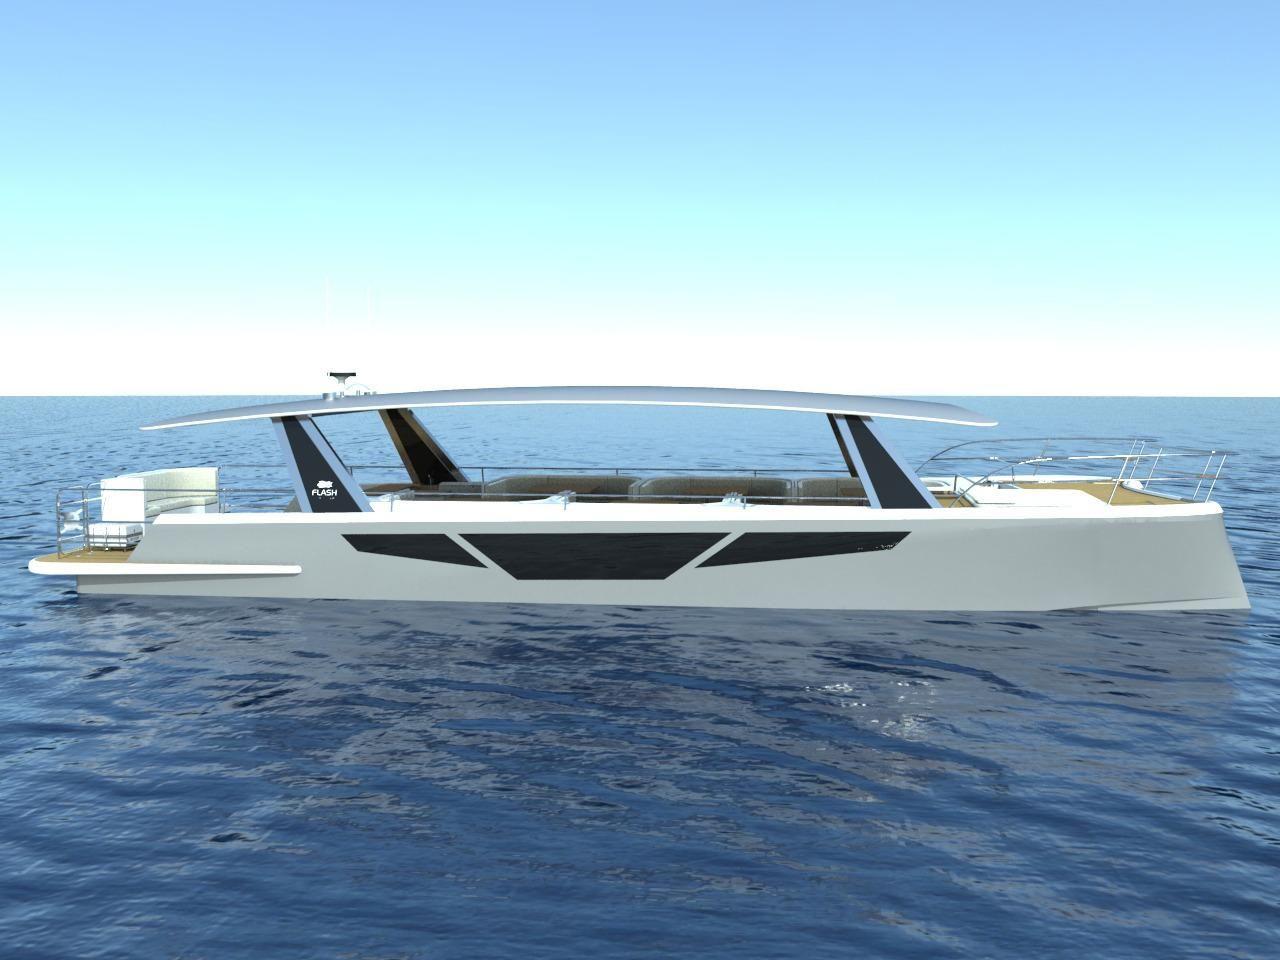 2016 Flash Catamarans FLASH CAT 58 PASSENGER Power Boat ...  2016 Flash Cata...